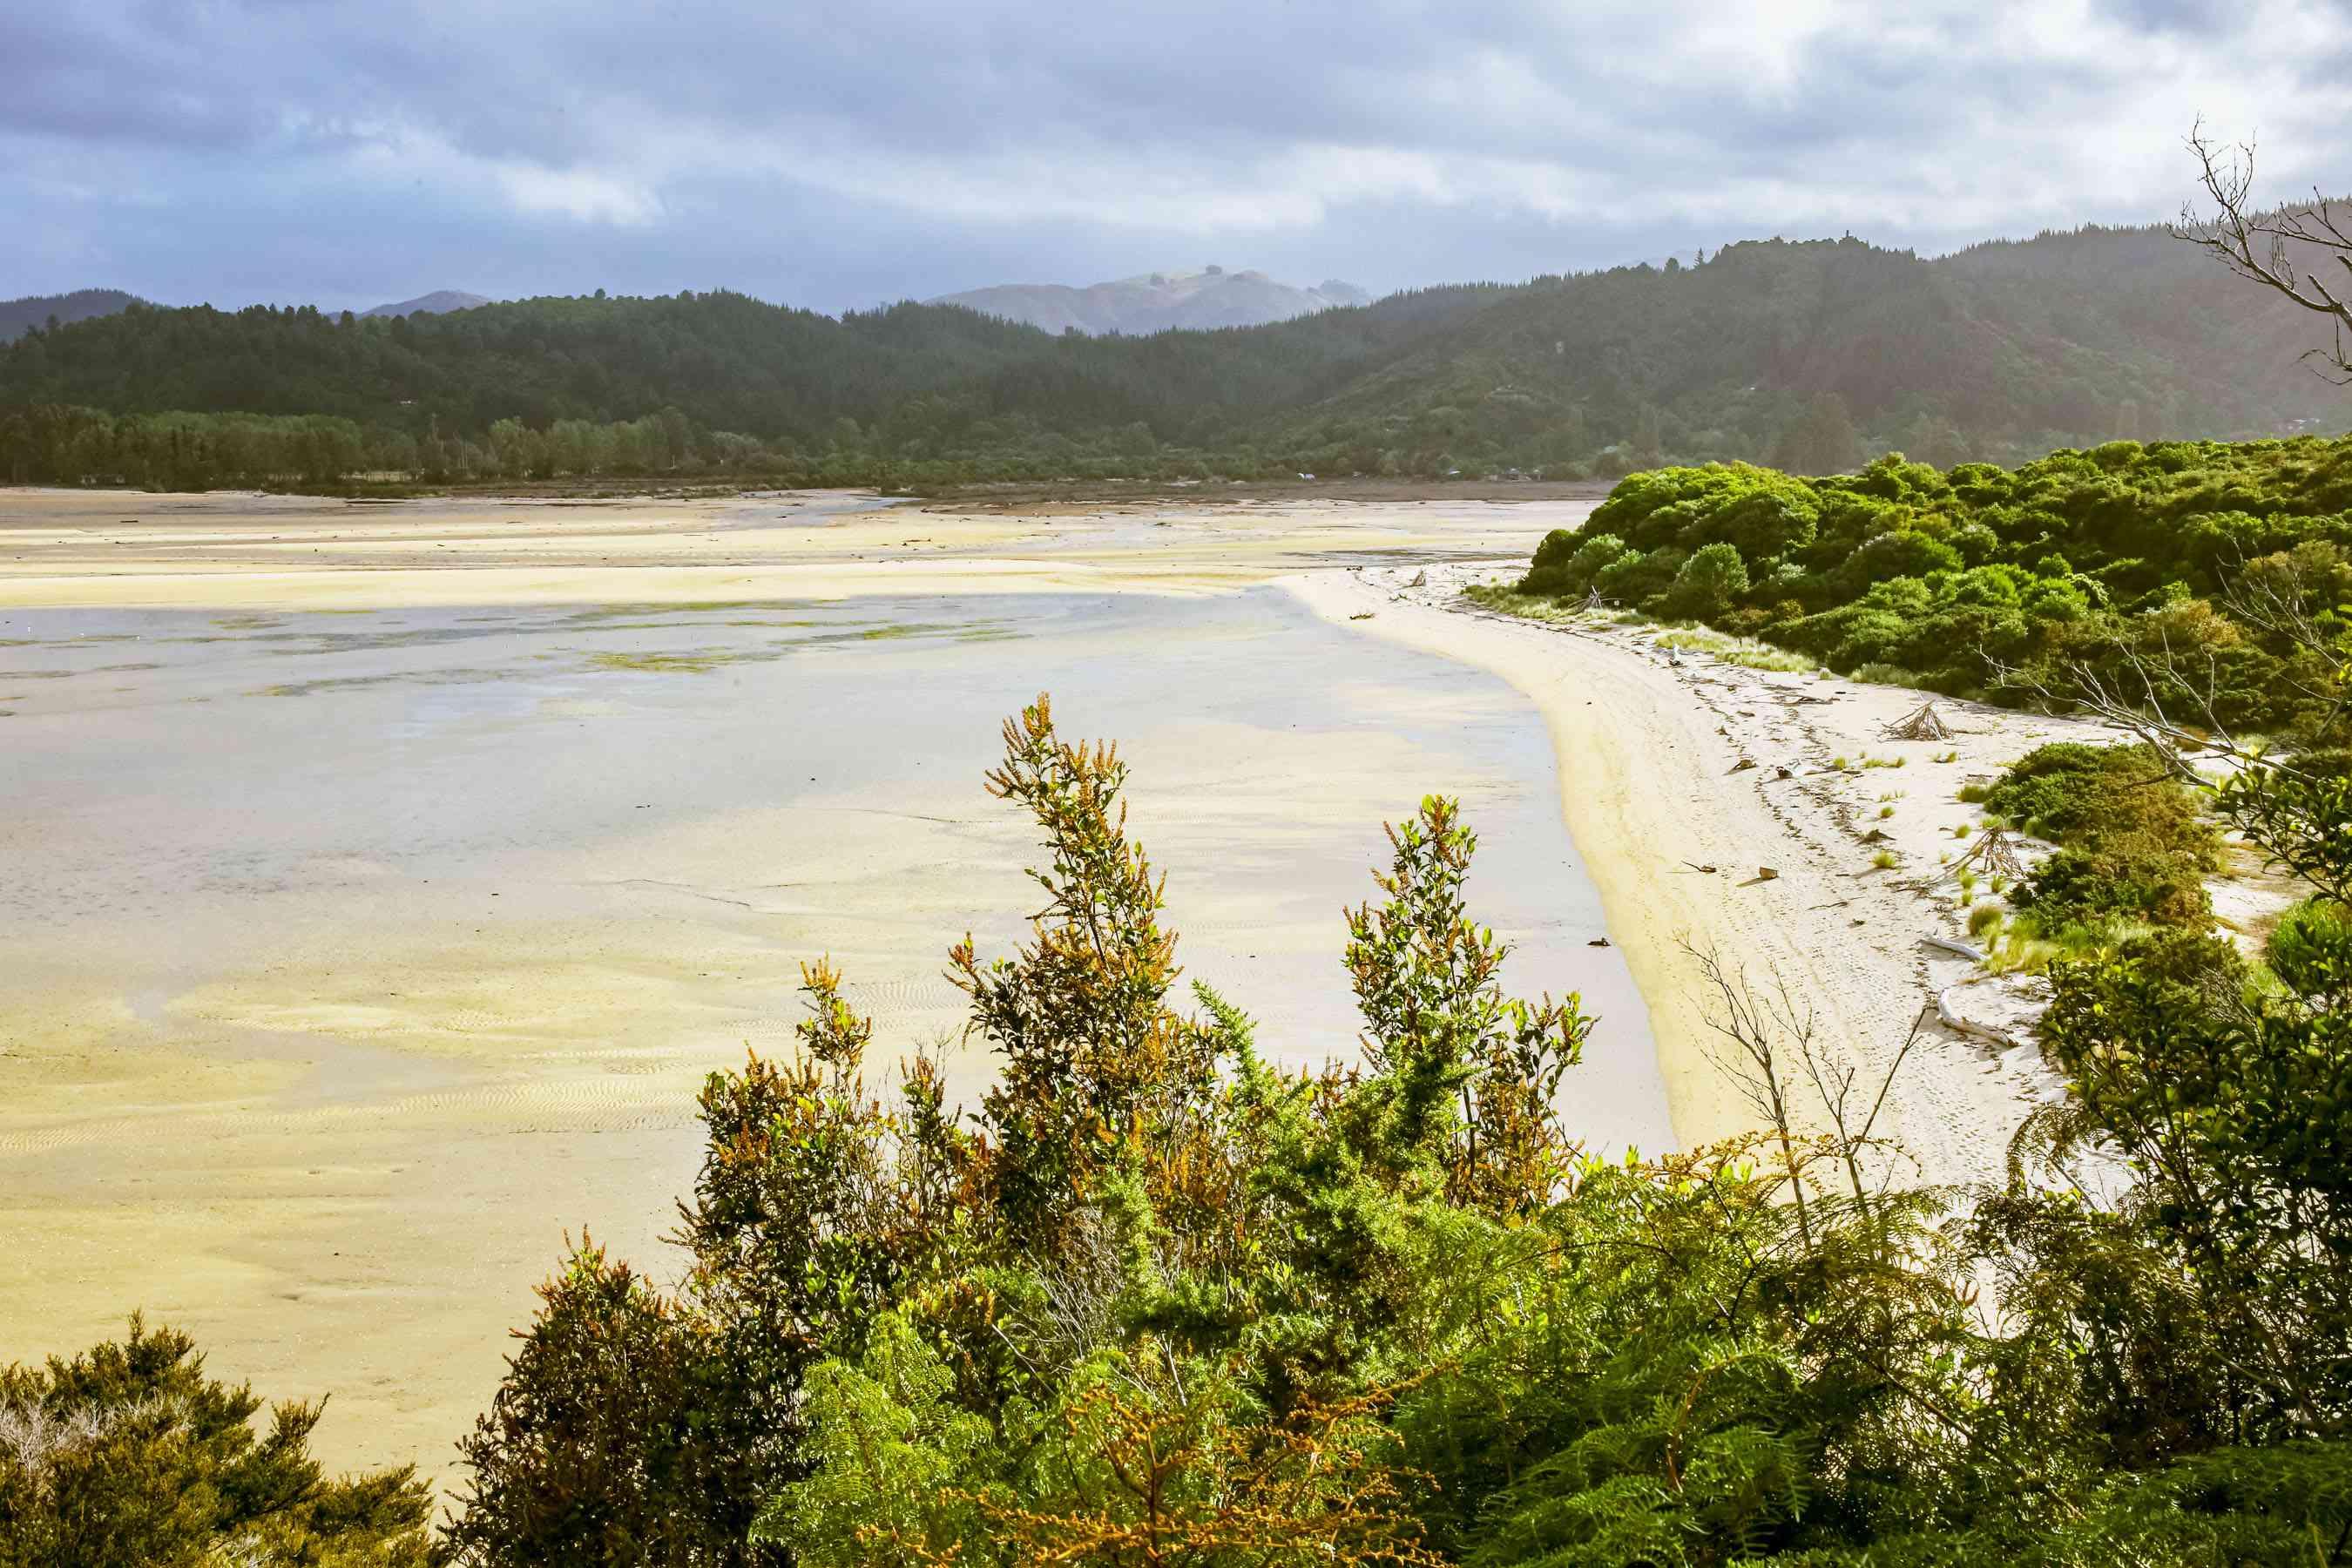 View of a sandy beach in Abel Tasman